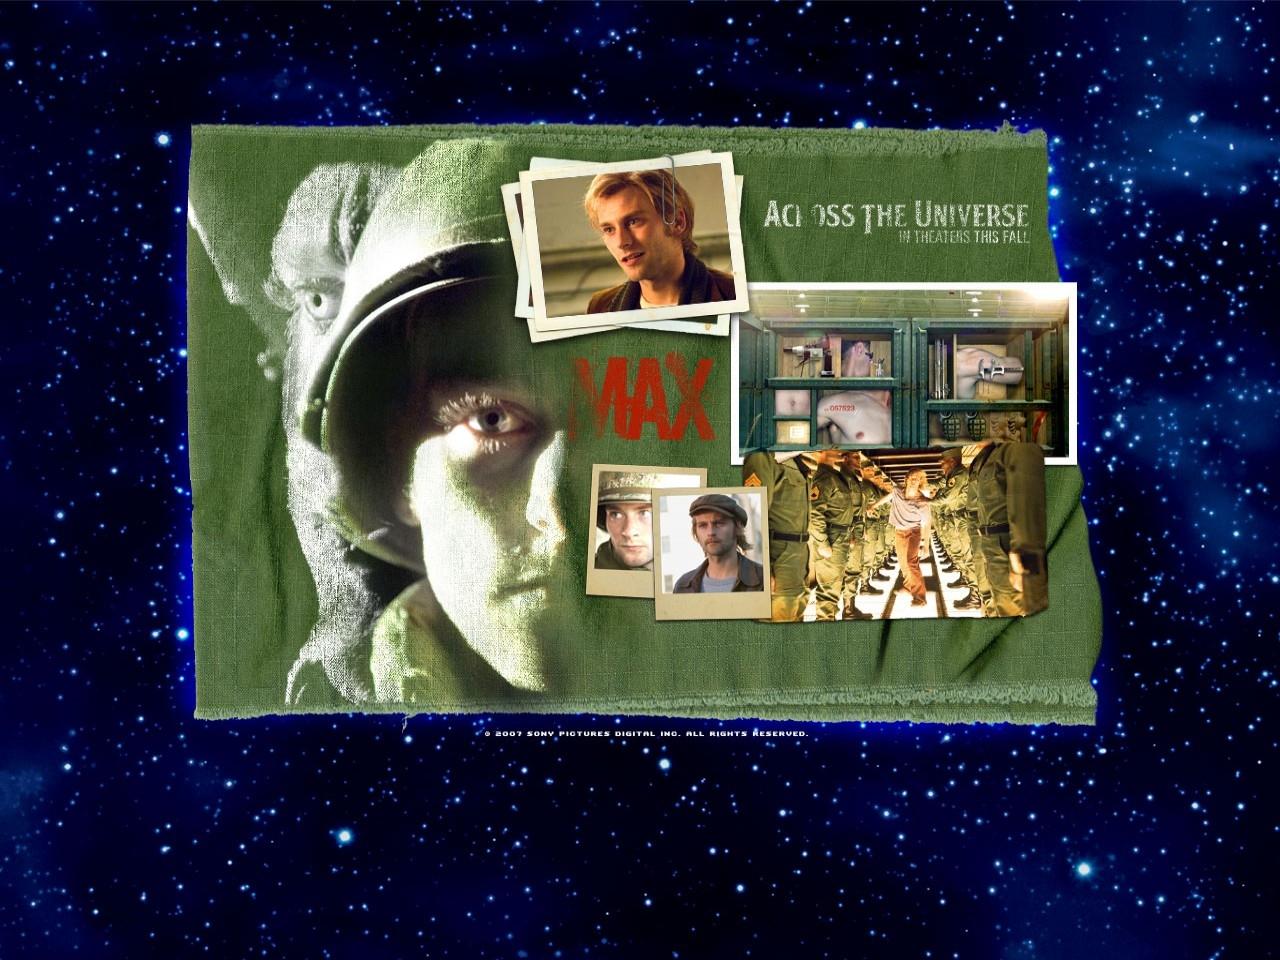 Wallpaper del film Across the Universe con Joe Anderson